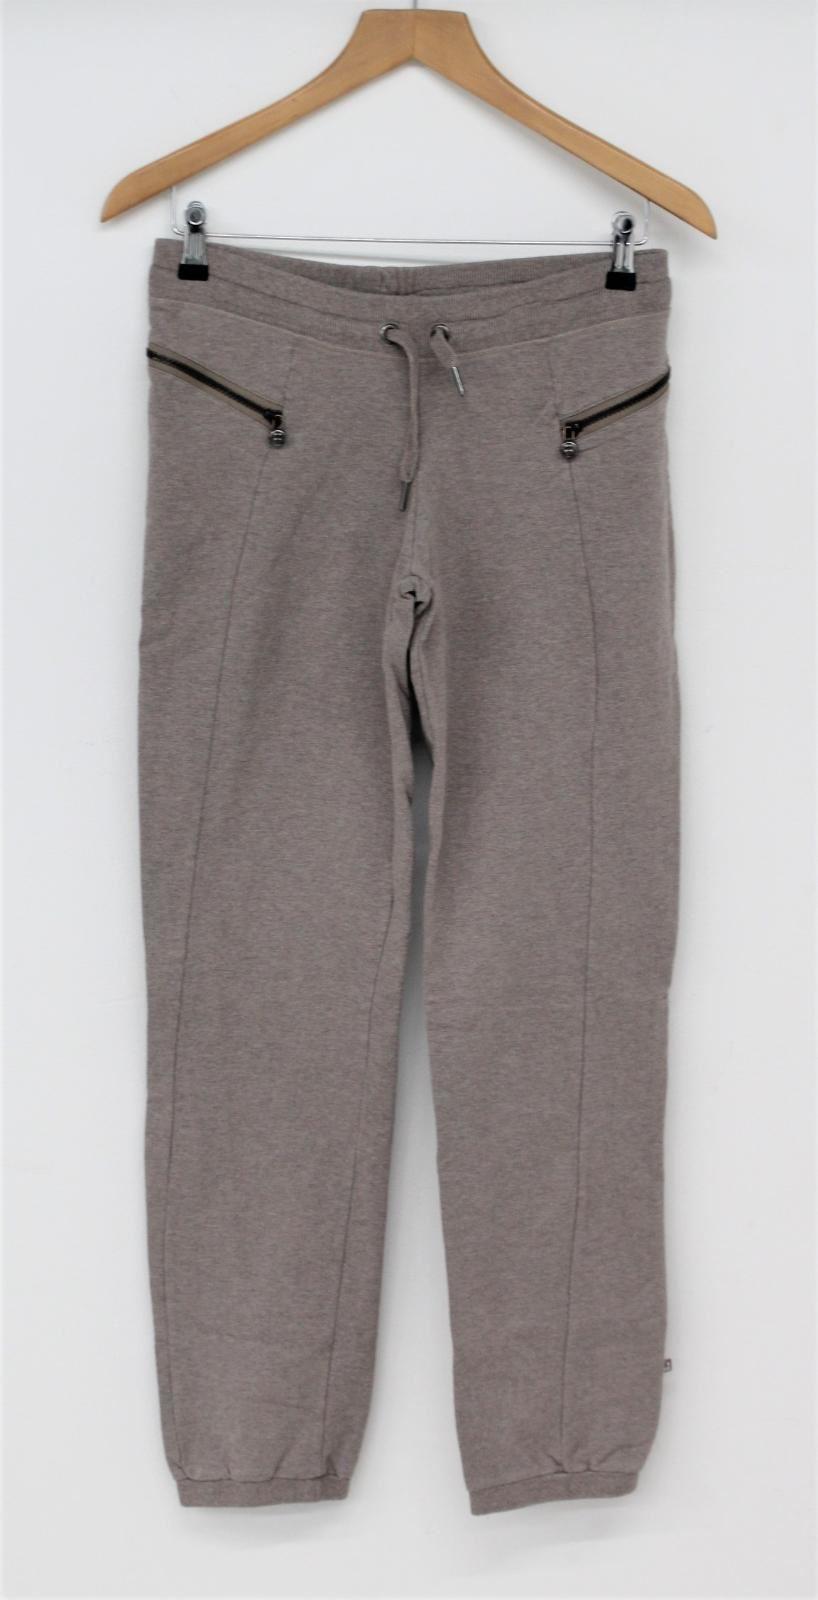 Sweaty-Betty-Damas-Malva-Mezcla-de-Algodon-Cintura-Elastica-Correr-Pantalones-S-W30